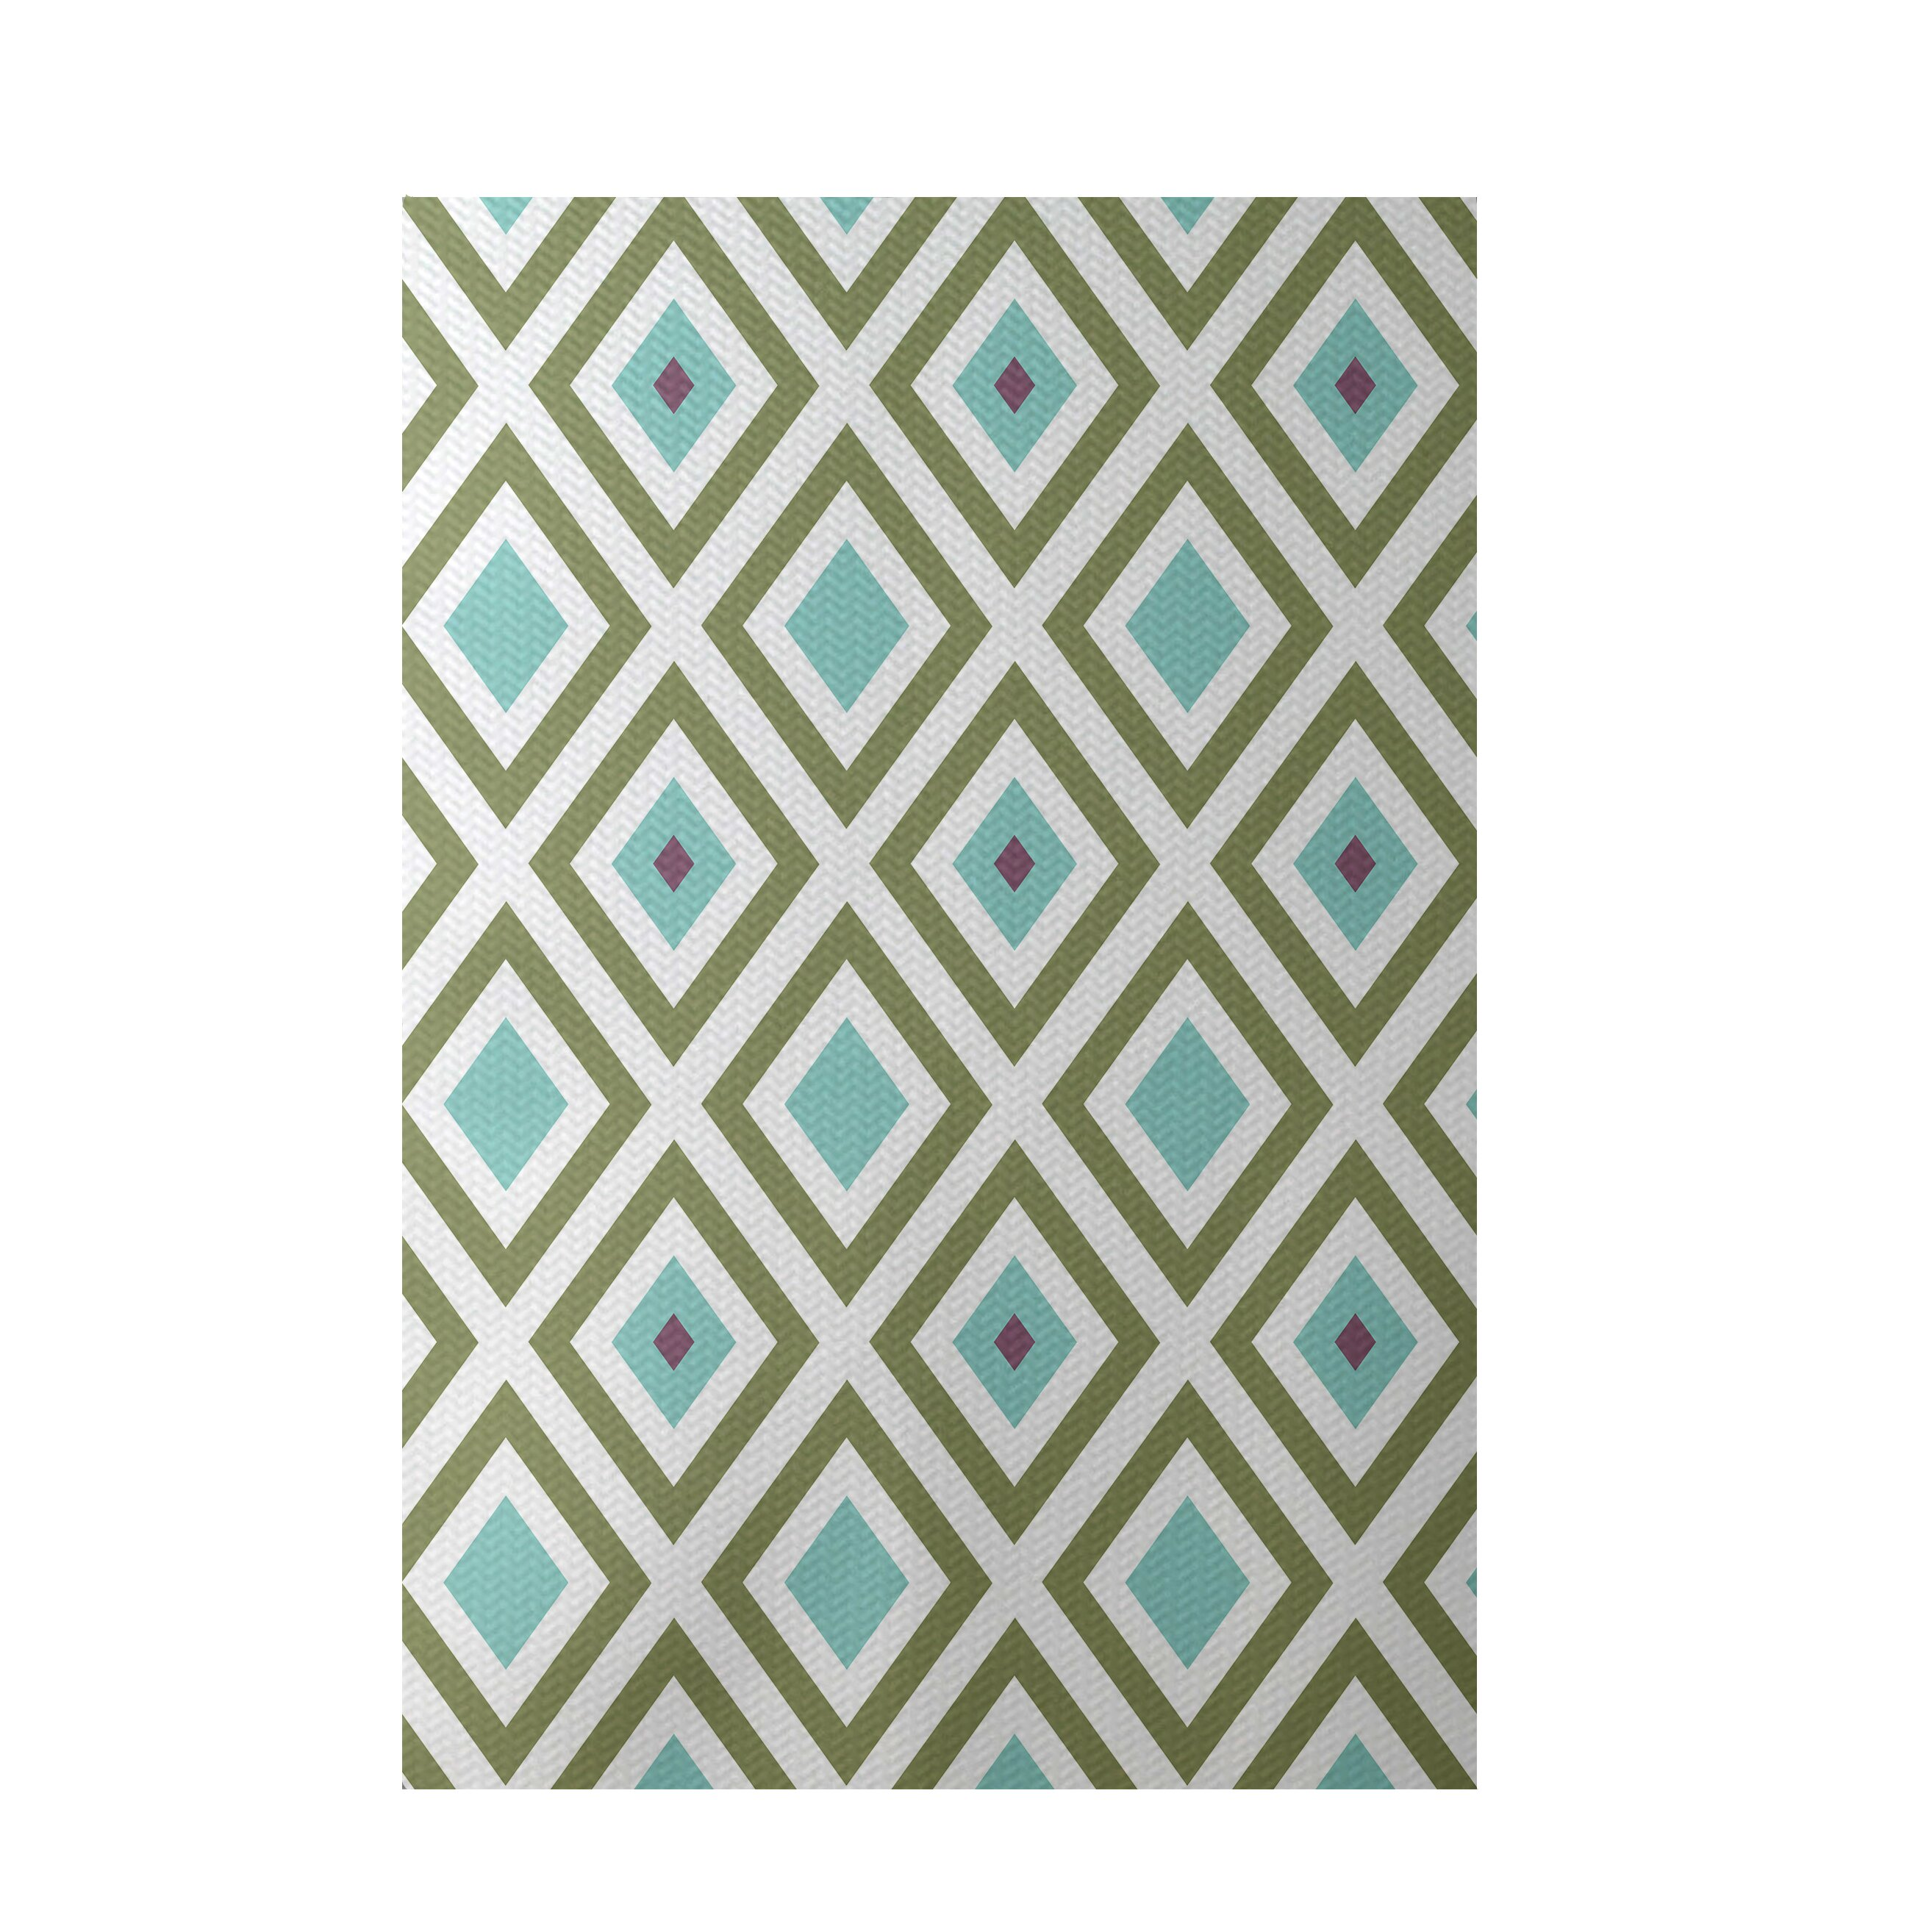 E by design geometric aqua indoor outdoor area rug for Geometric pattern area rugs